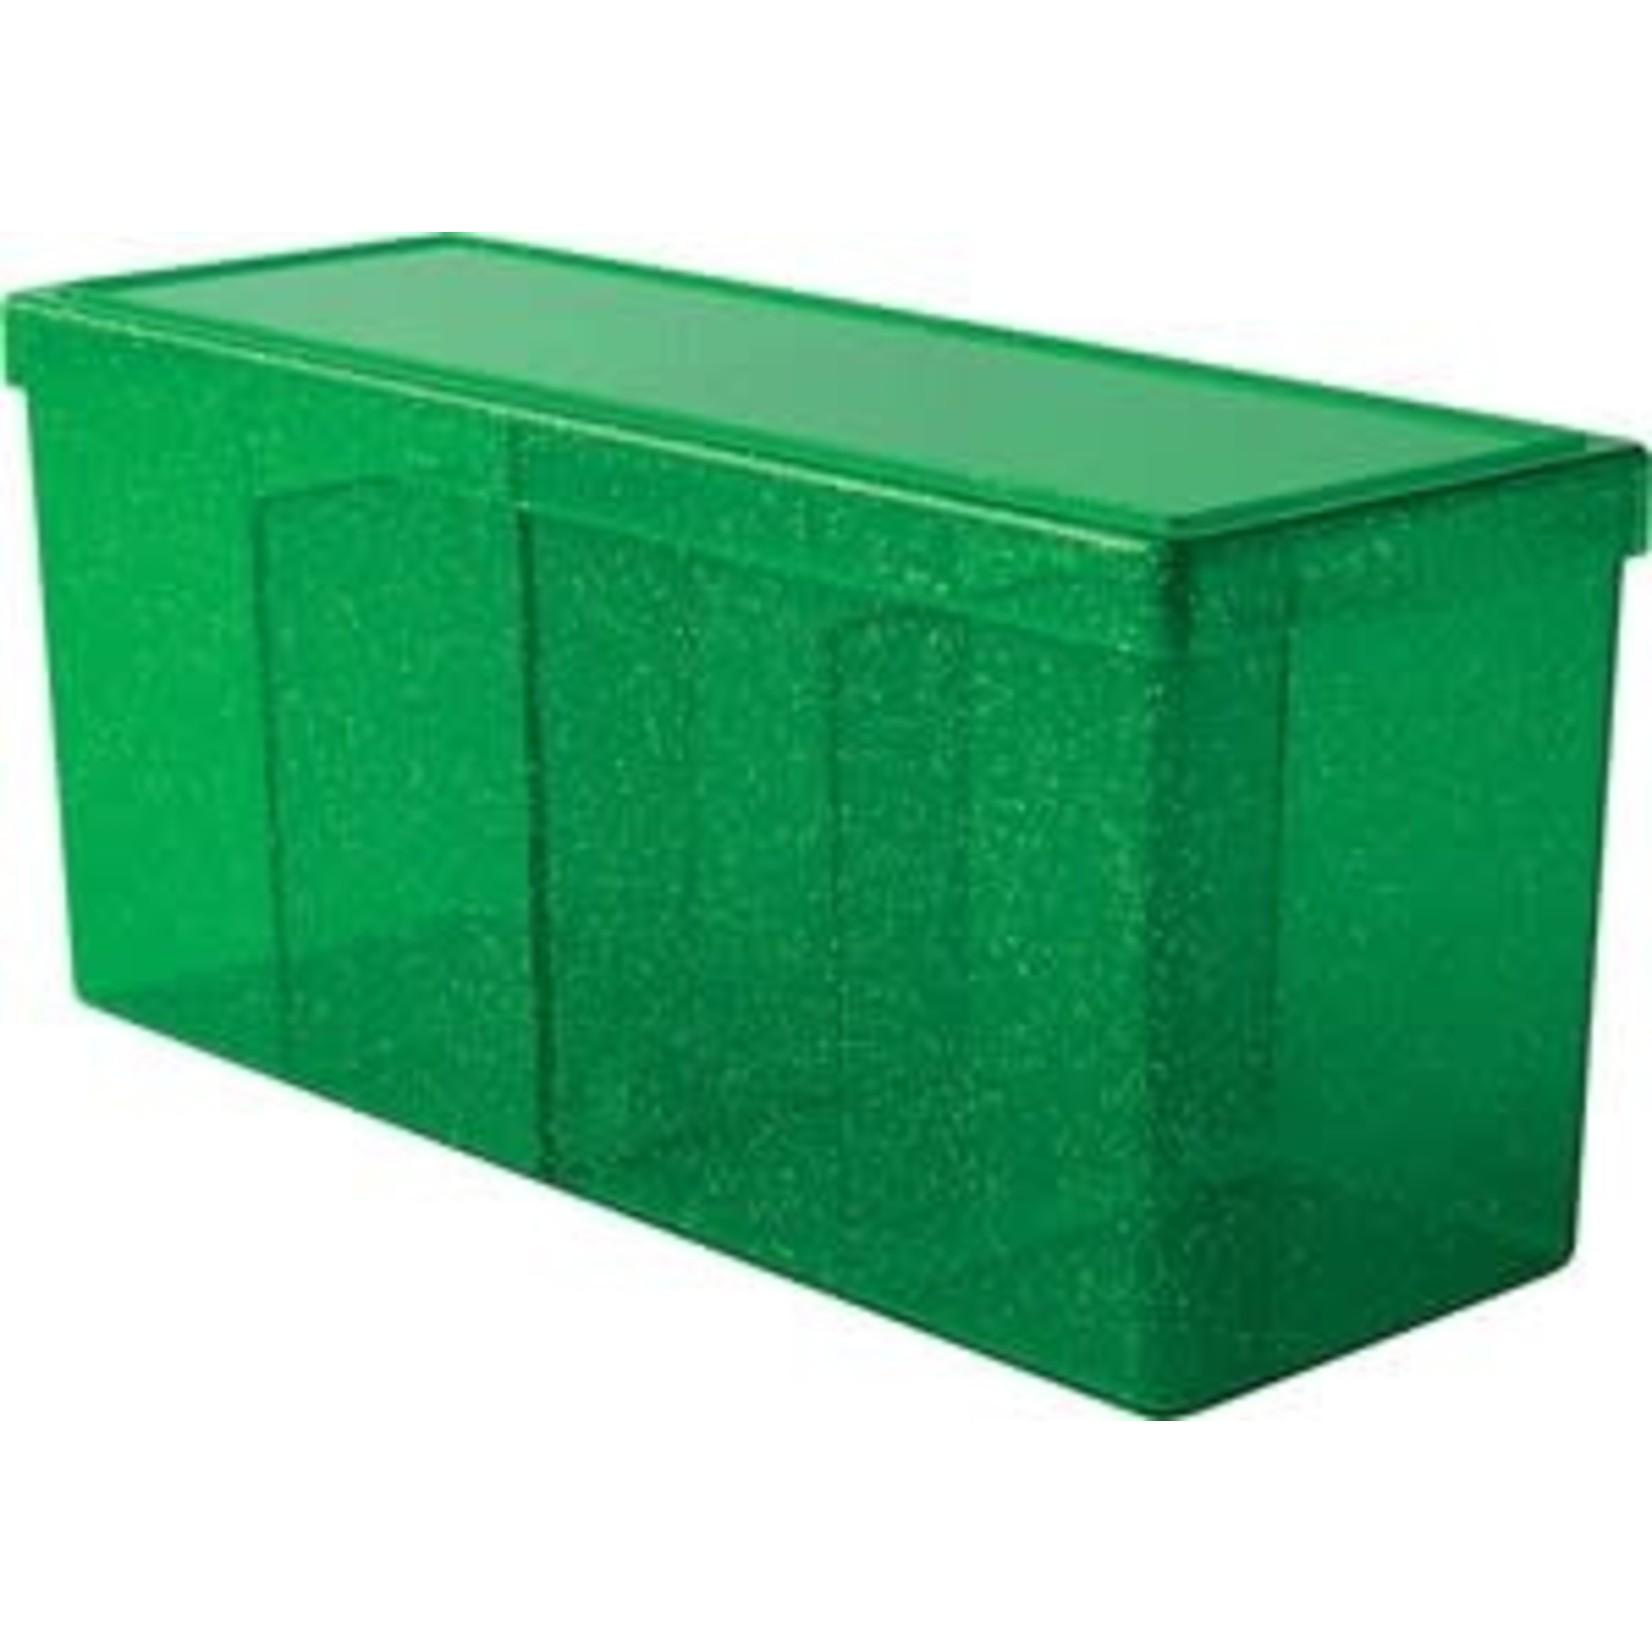 Arcane Tinman Dragon Shield: 4 Compartment Deckbox - Green